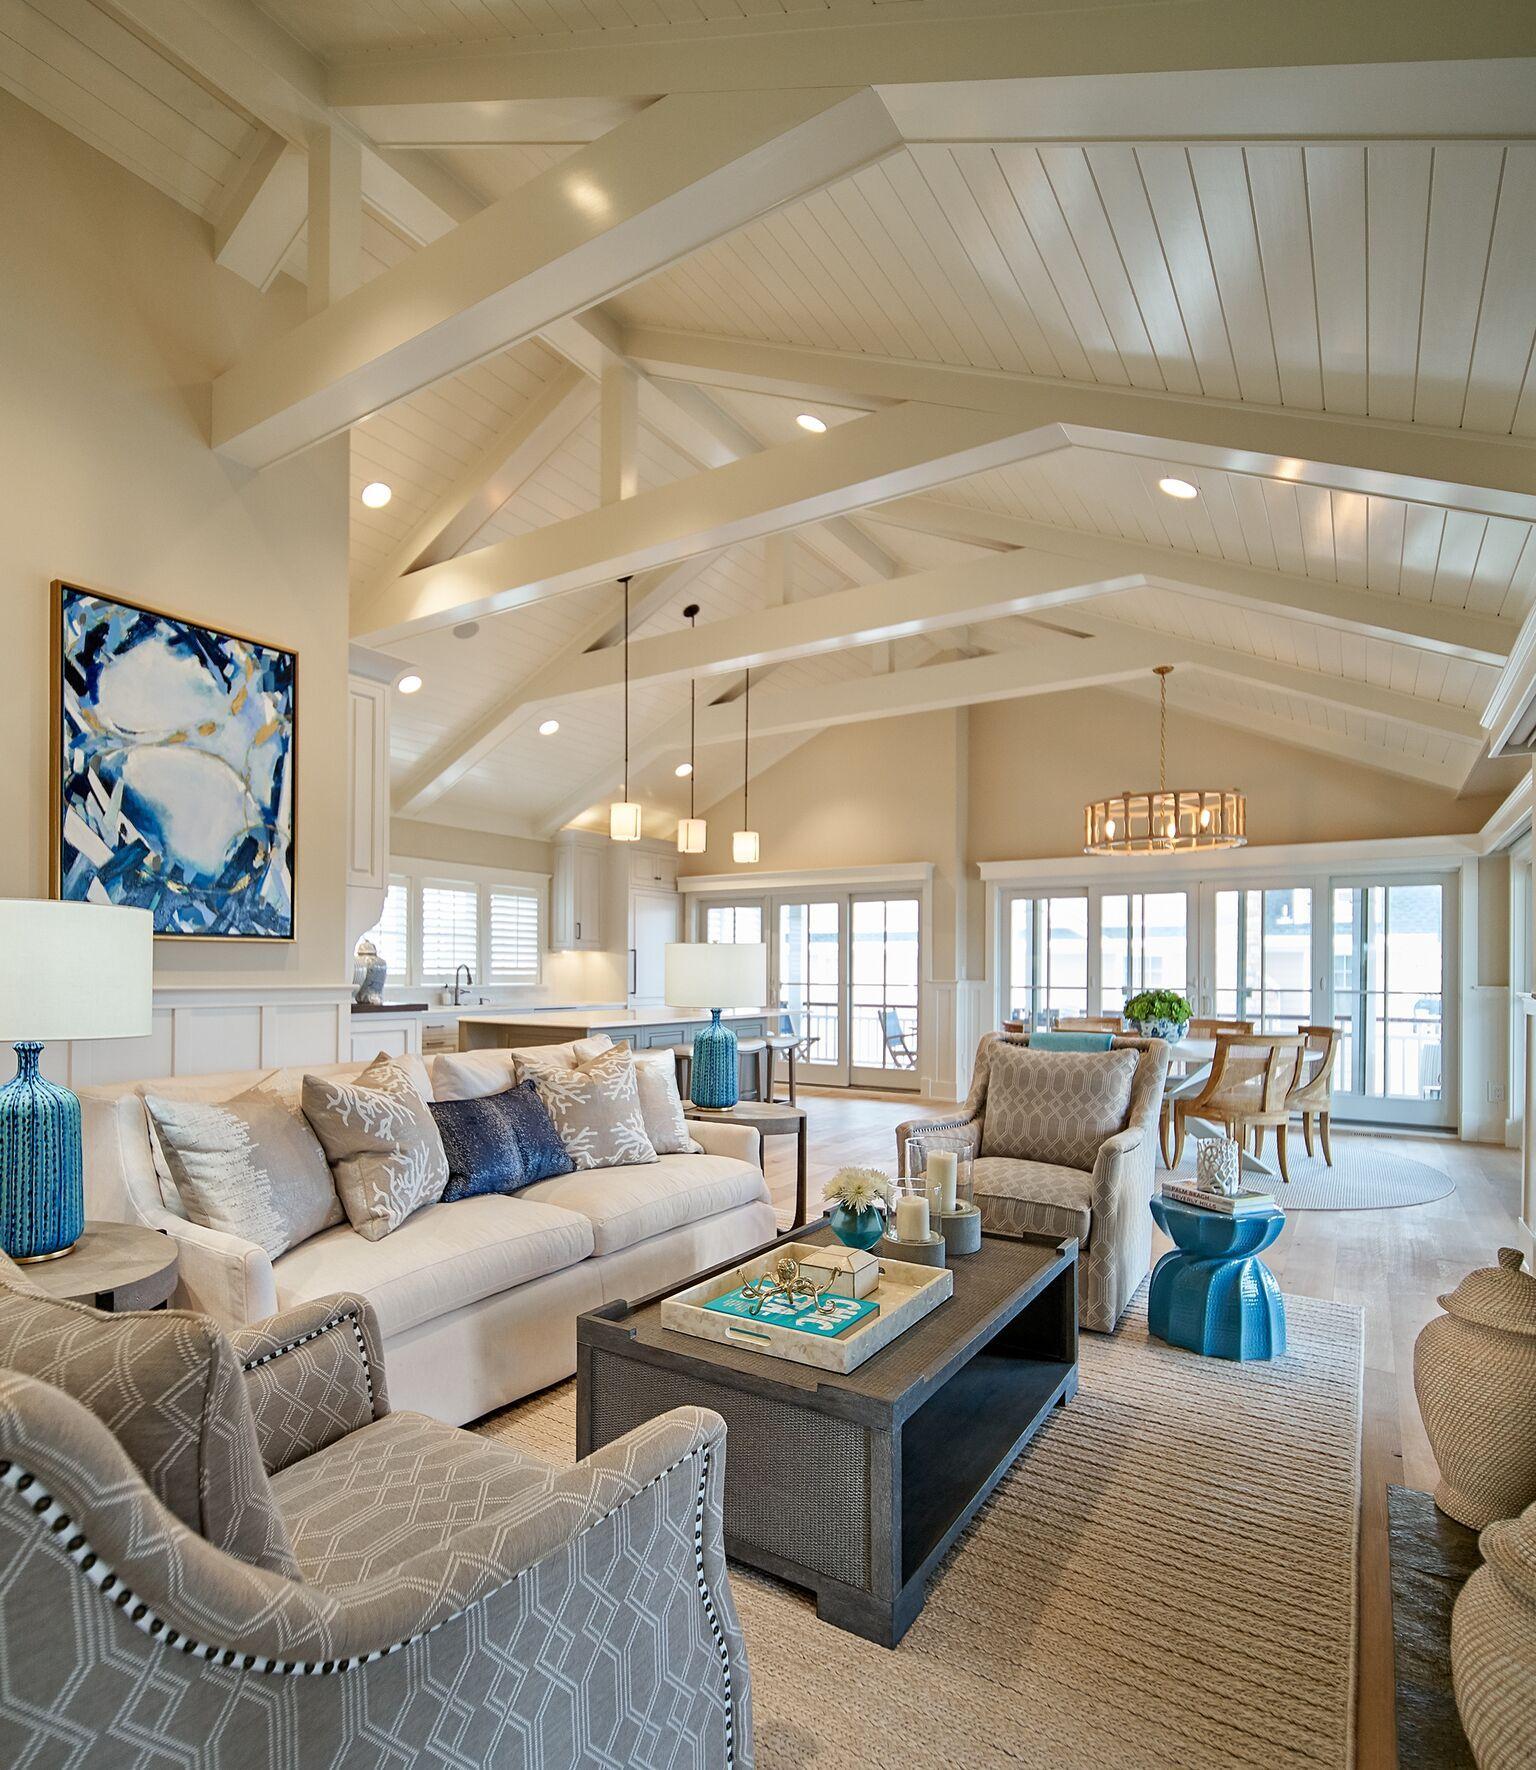 Beach Home Interior Design Ideas: The Design Studio - The Blue Octagon